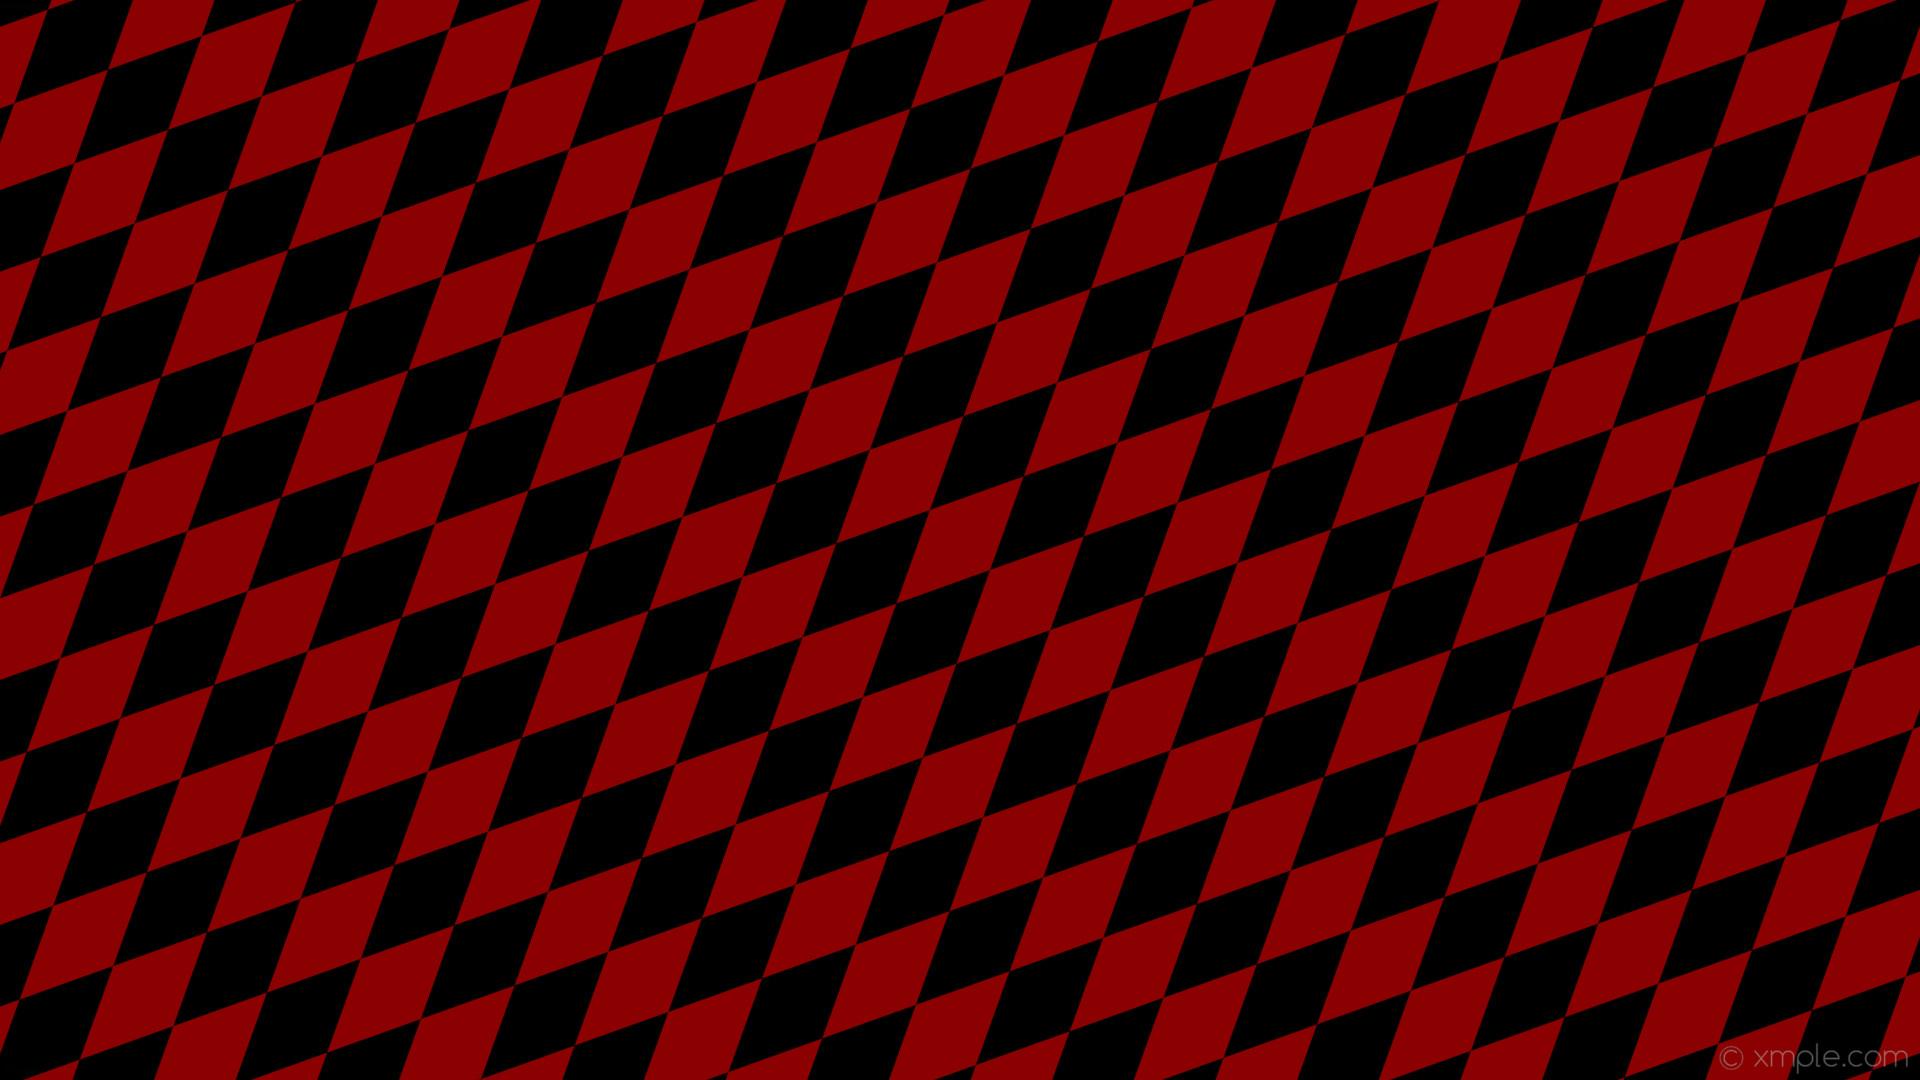 Res: 1920x1080, wallpaper black diamond red lozenge rhombus dark red #8b0000 #000000 45°  180px 85px